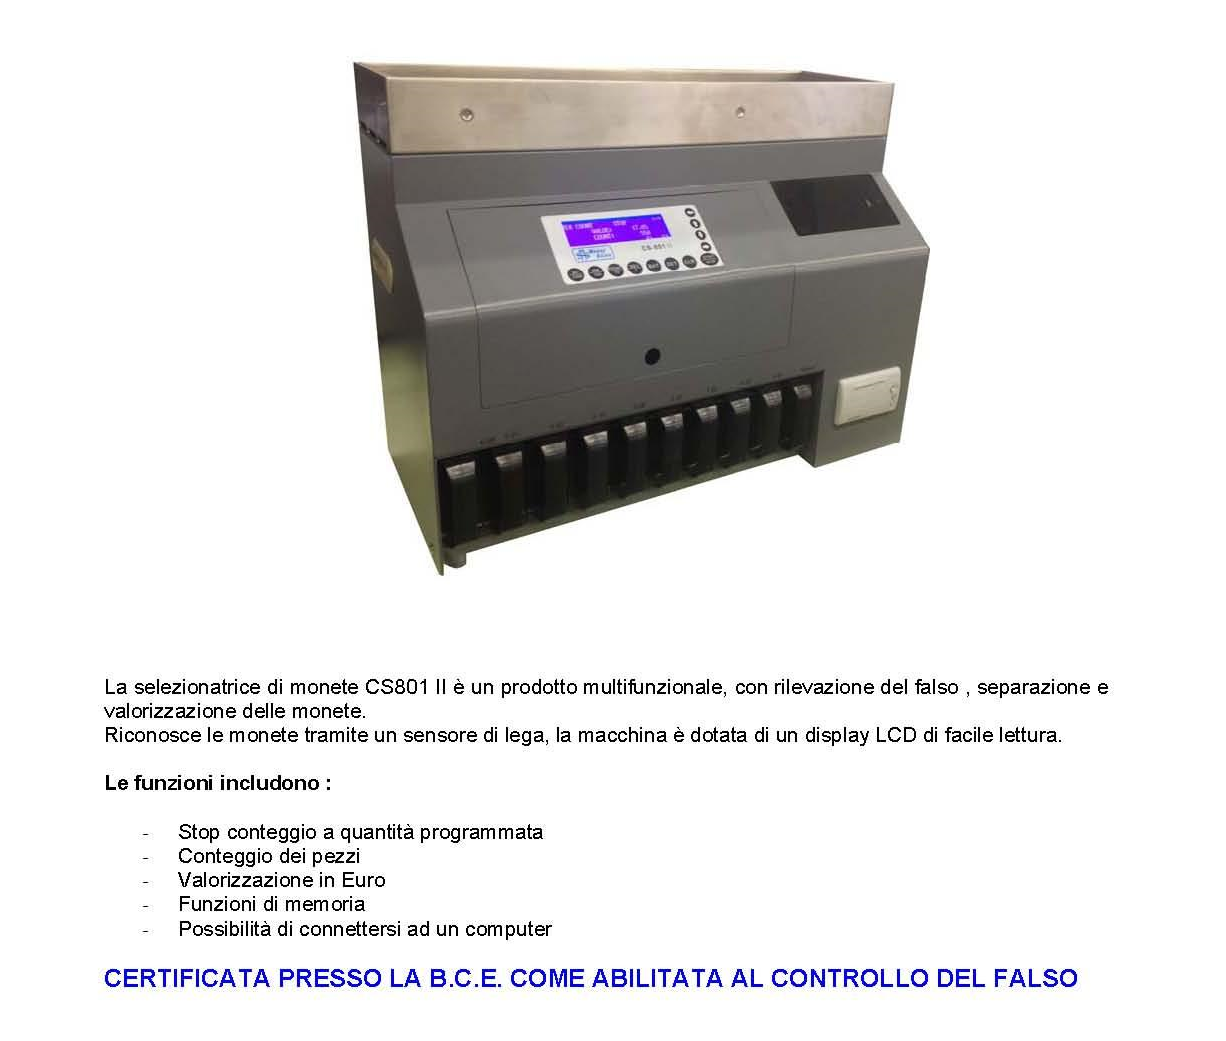 Dep. selezionatrice di monete CS801II_p1